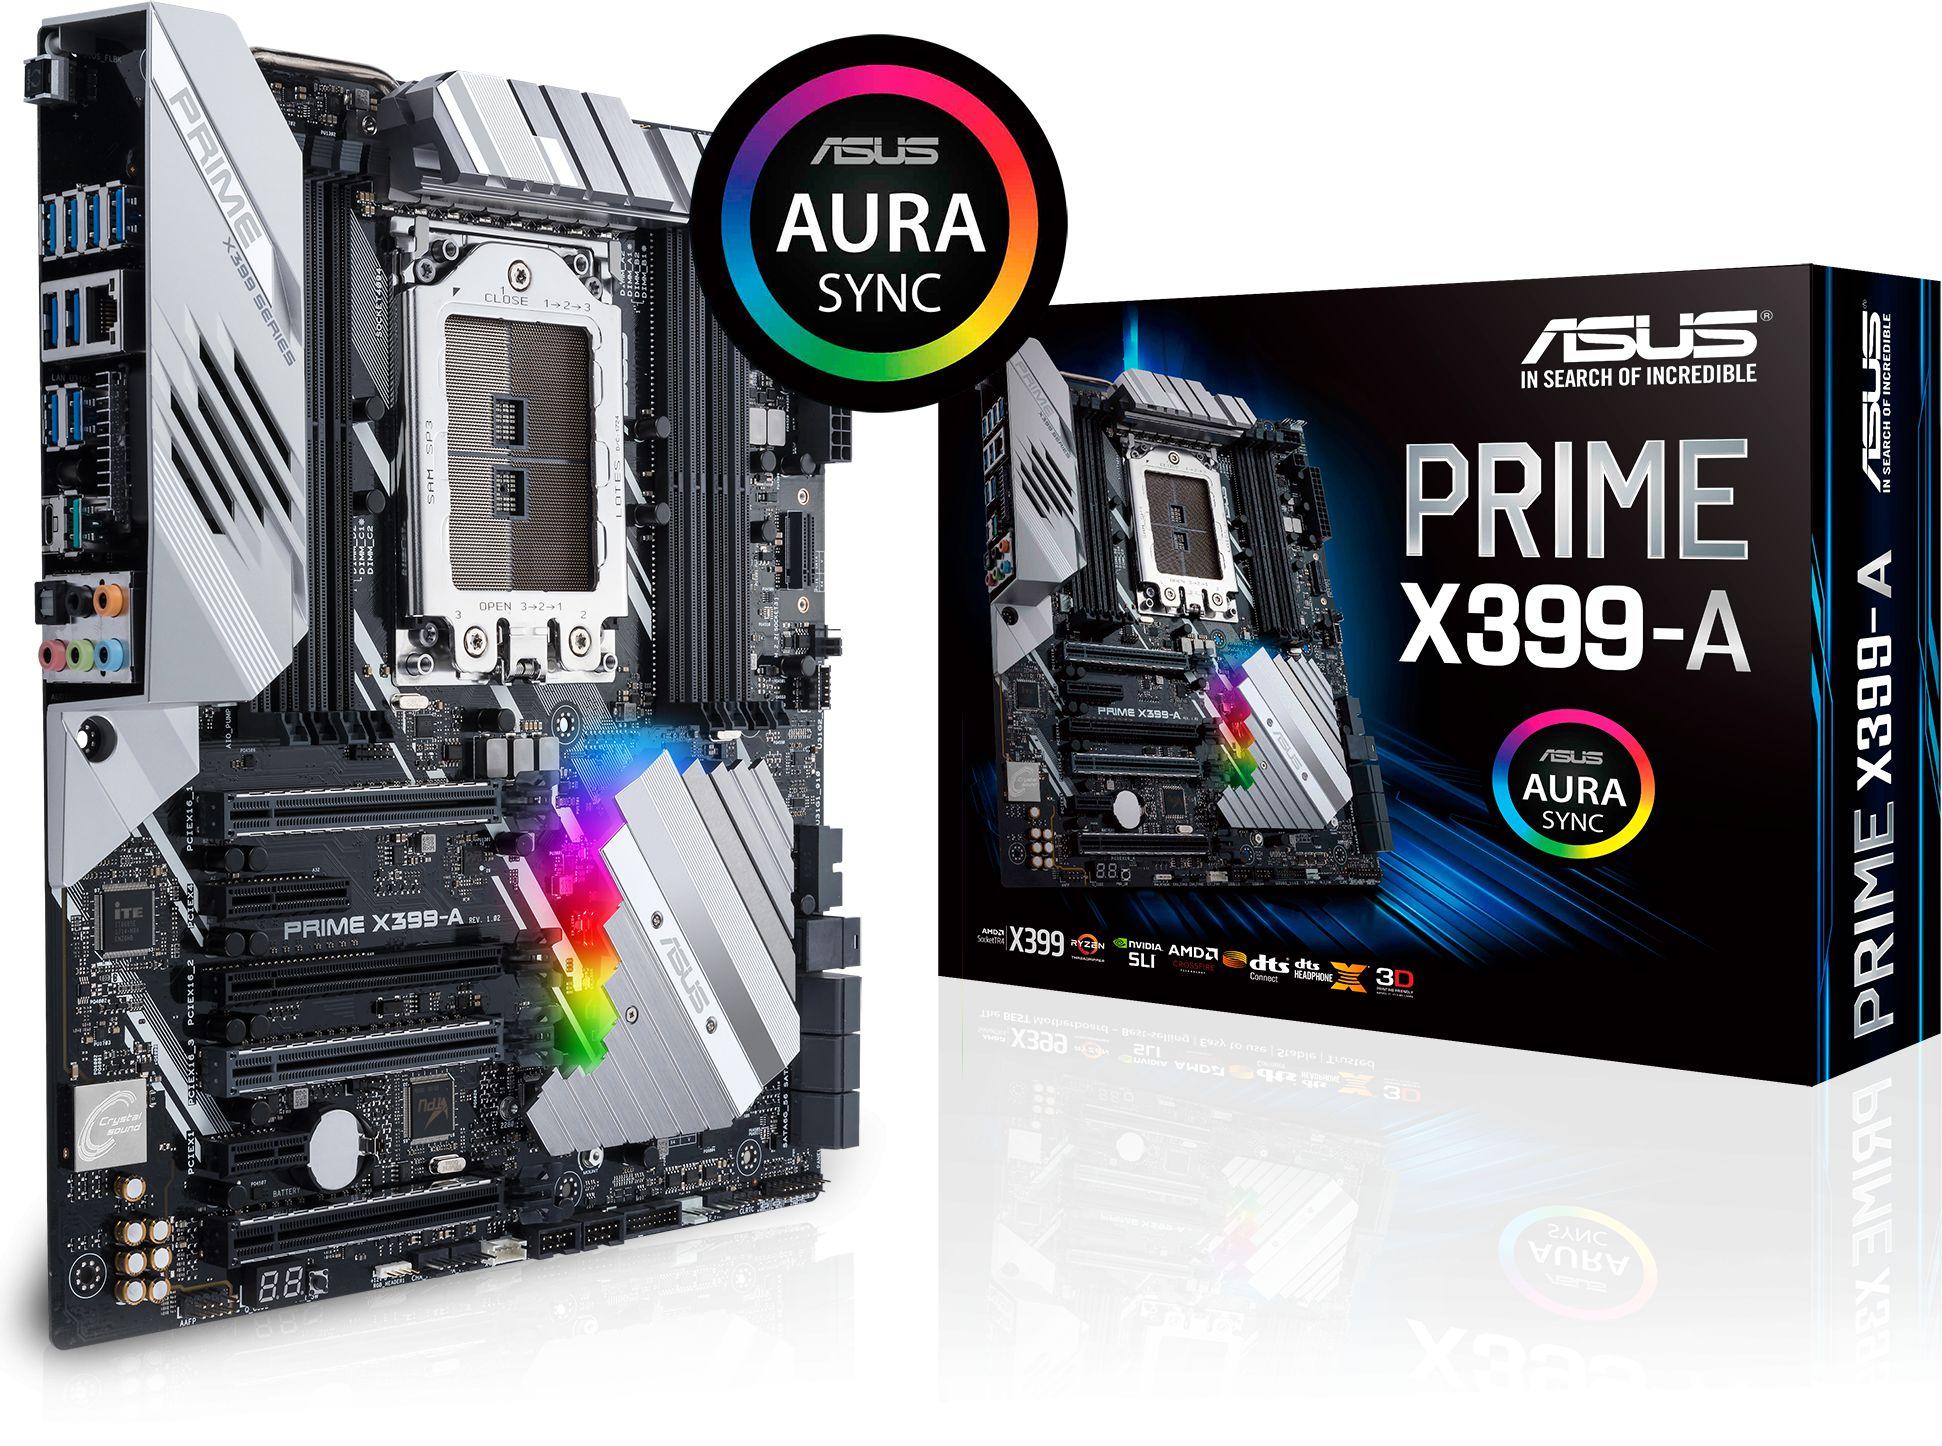 Prime X399 A Amd Sockettr4 Eatx Motherboard